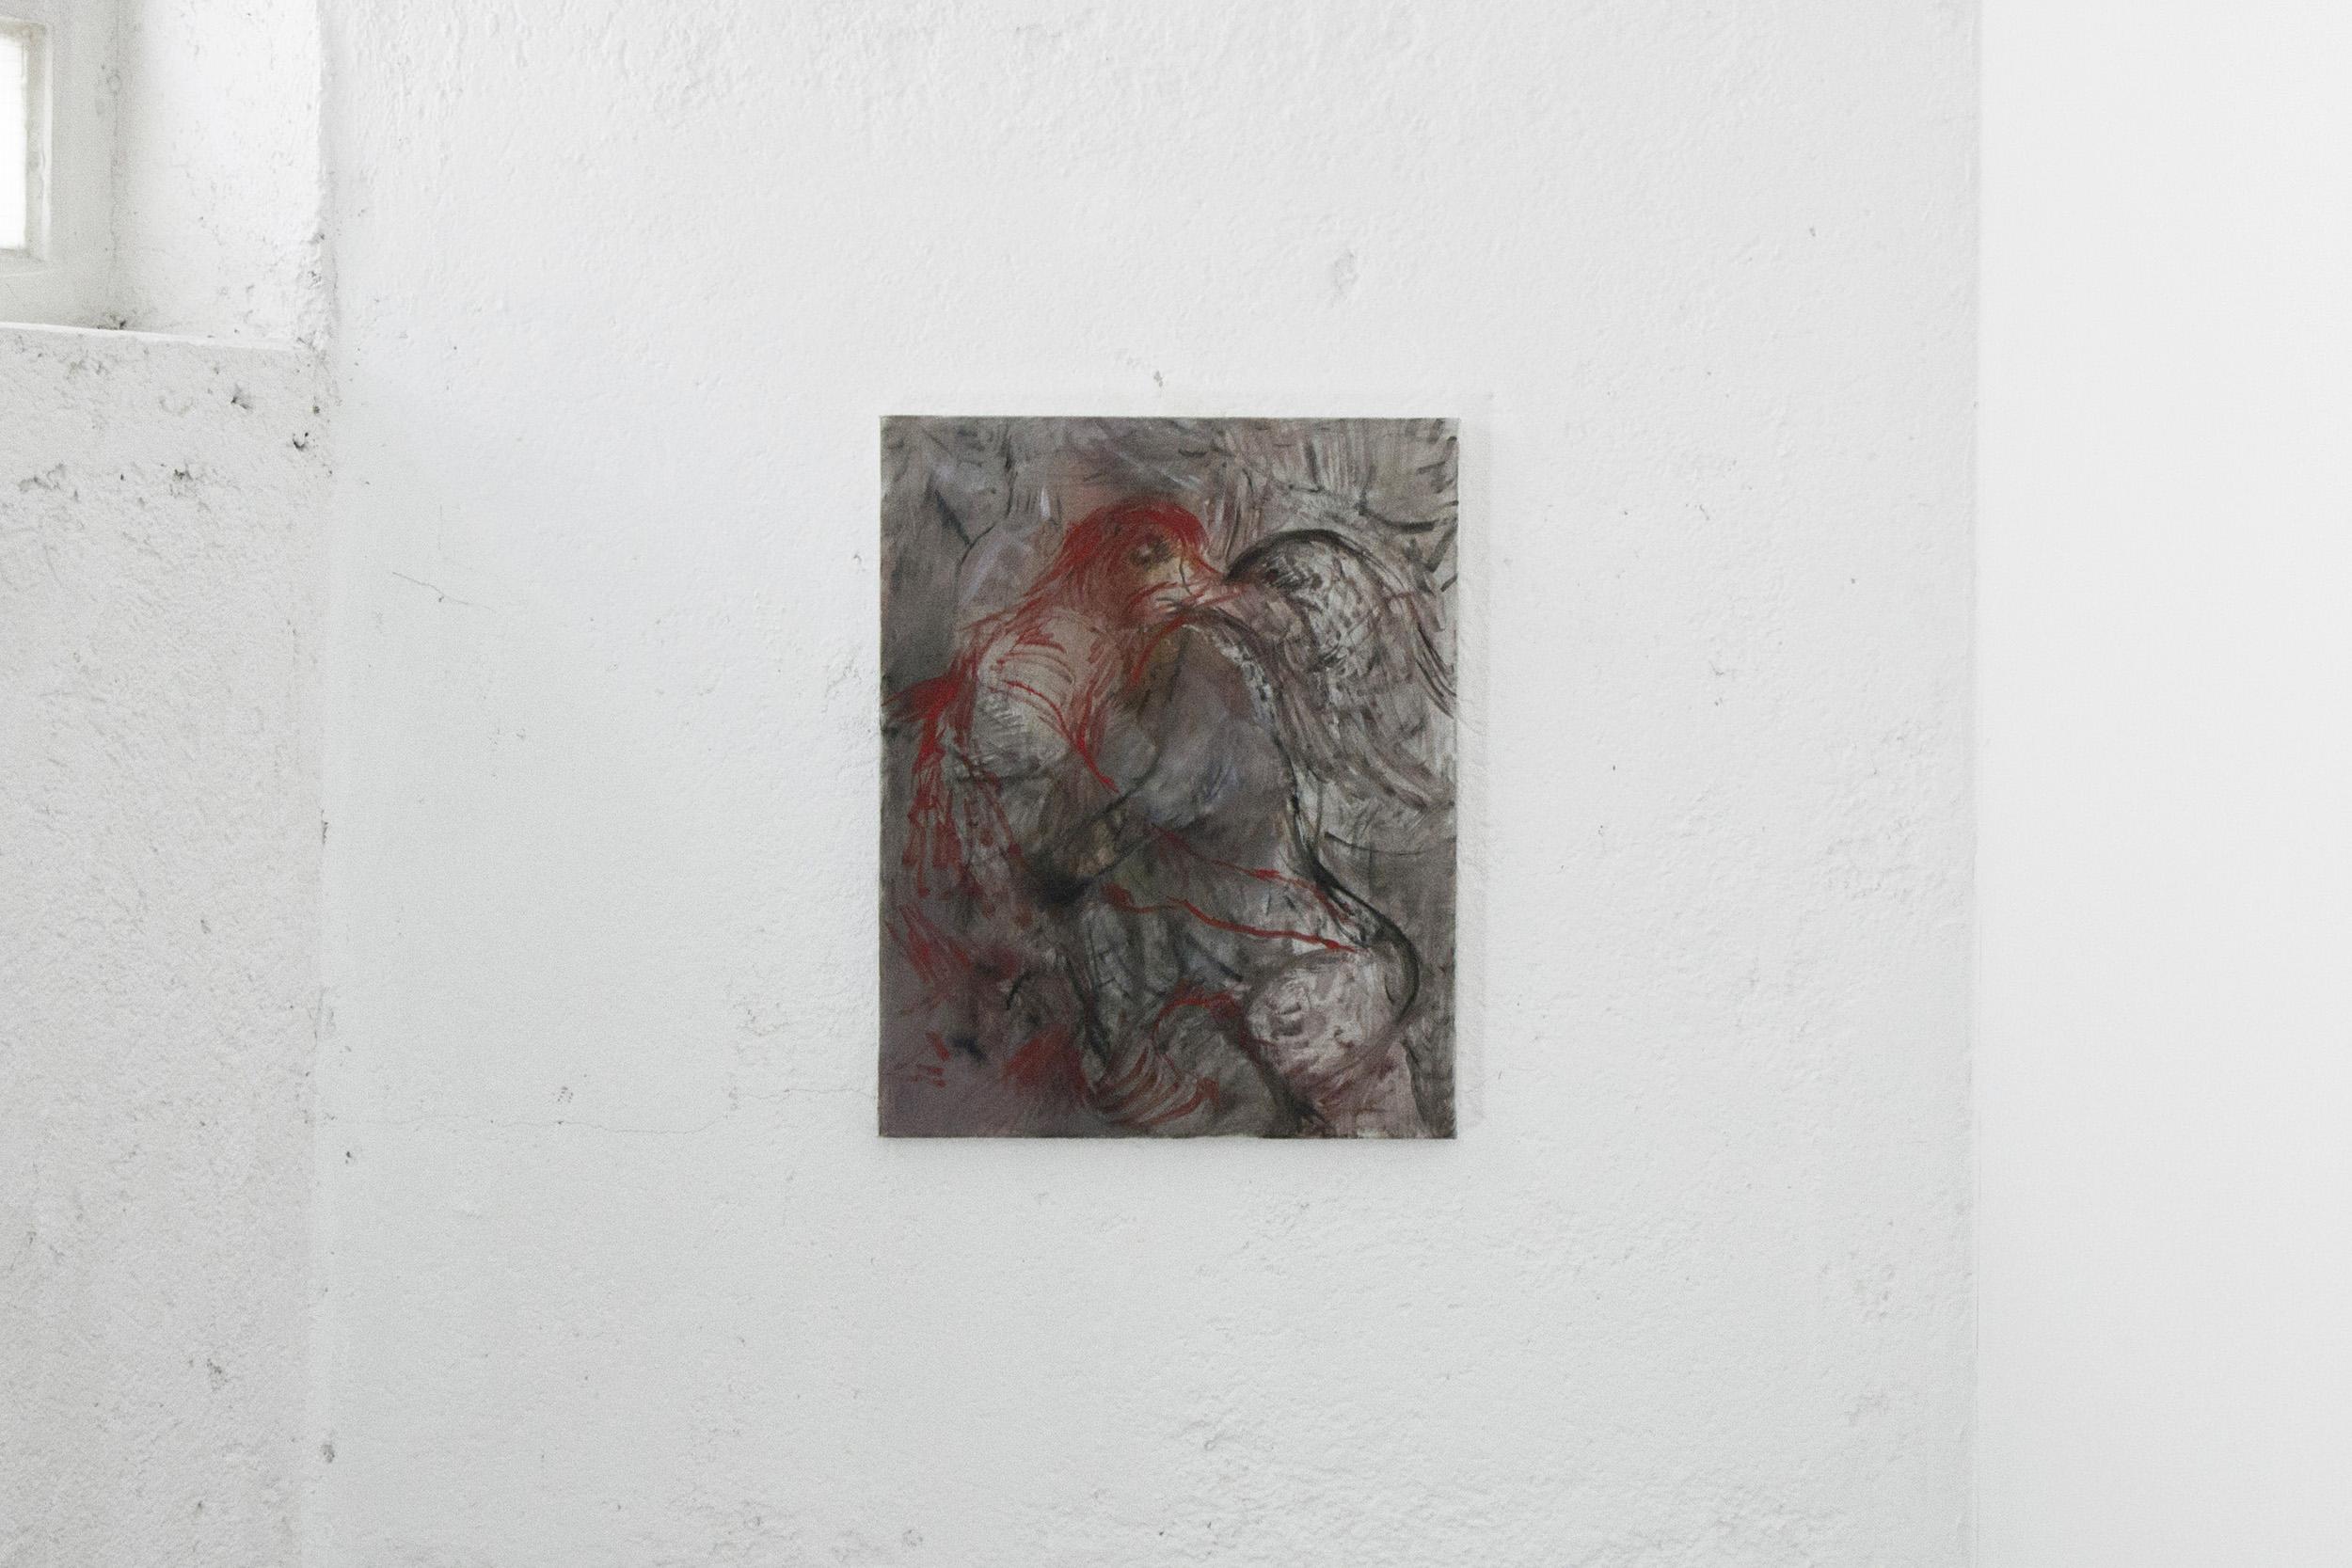 4 - Jacopo Casadei at Yellow